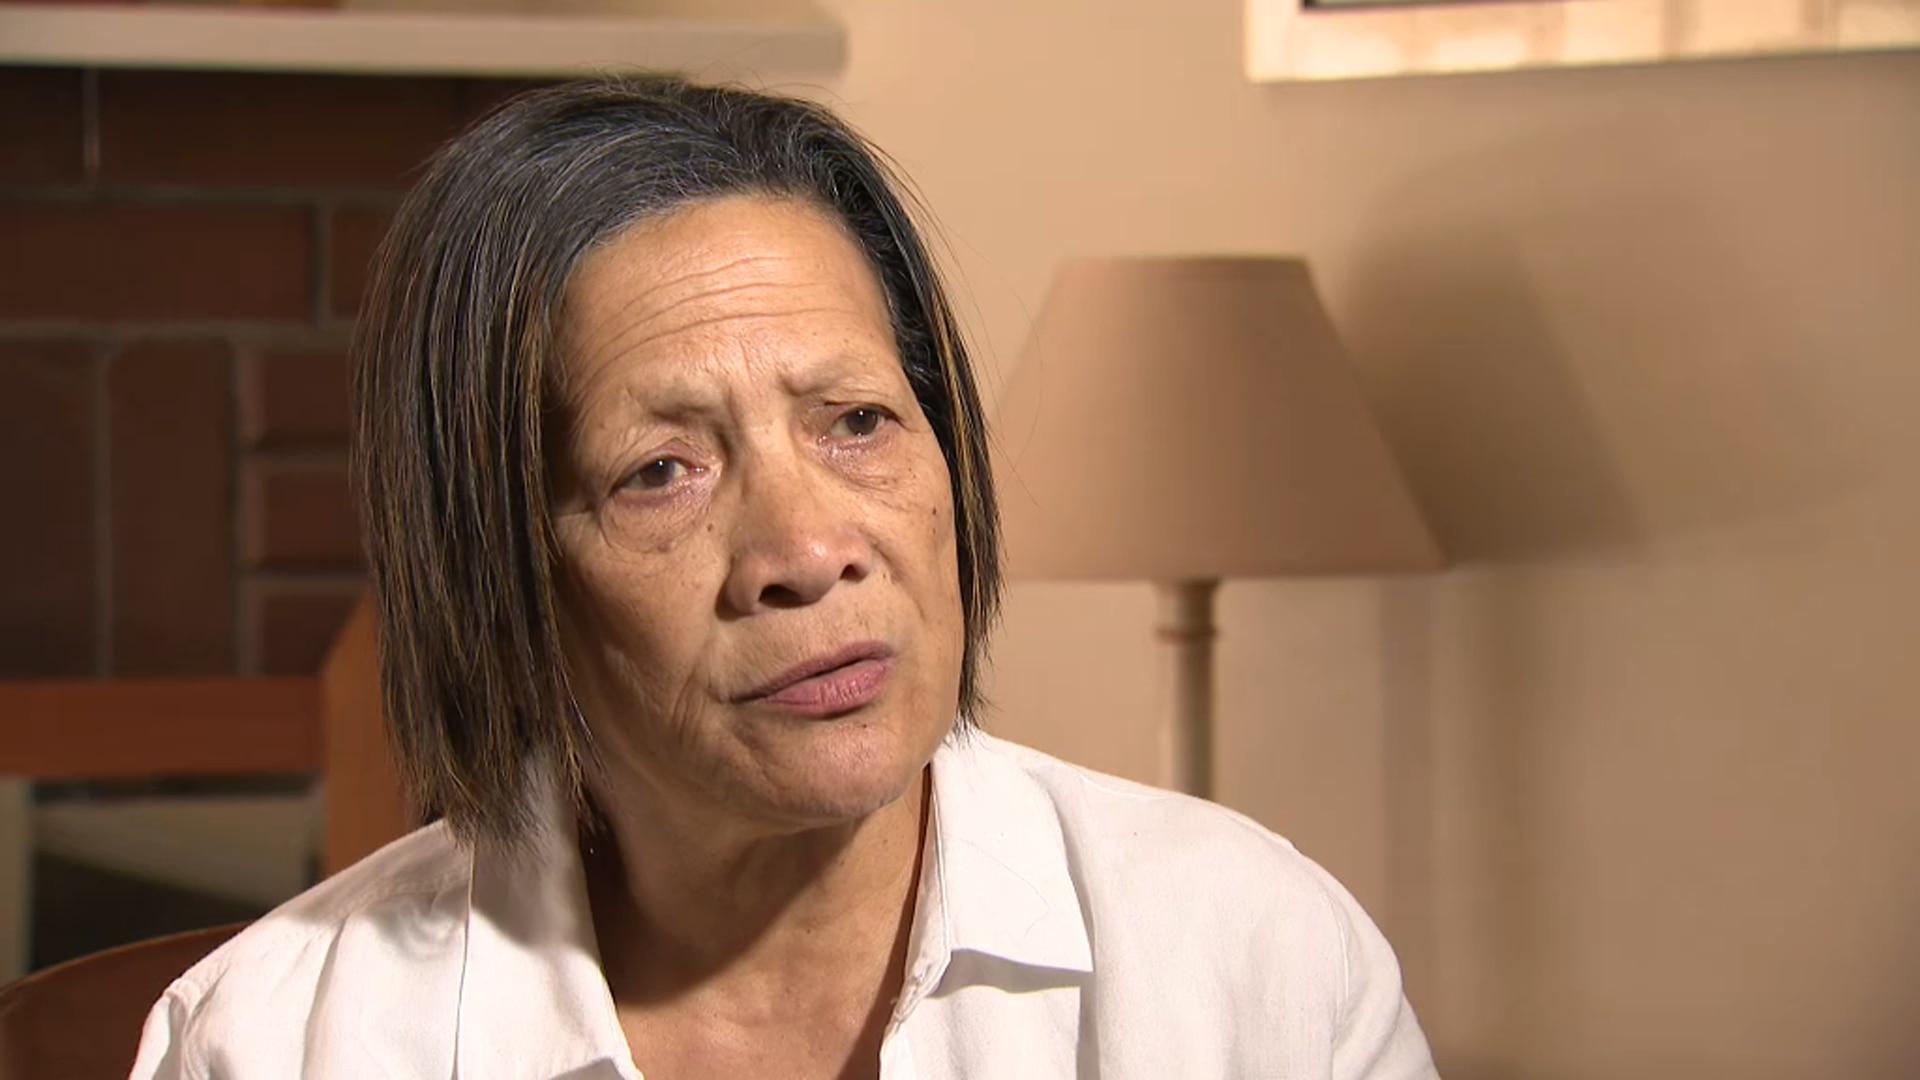 Hera Peihopa's son Robert died in Villawood in 2016.